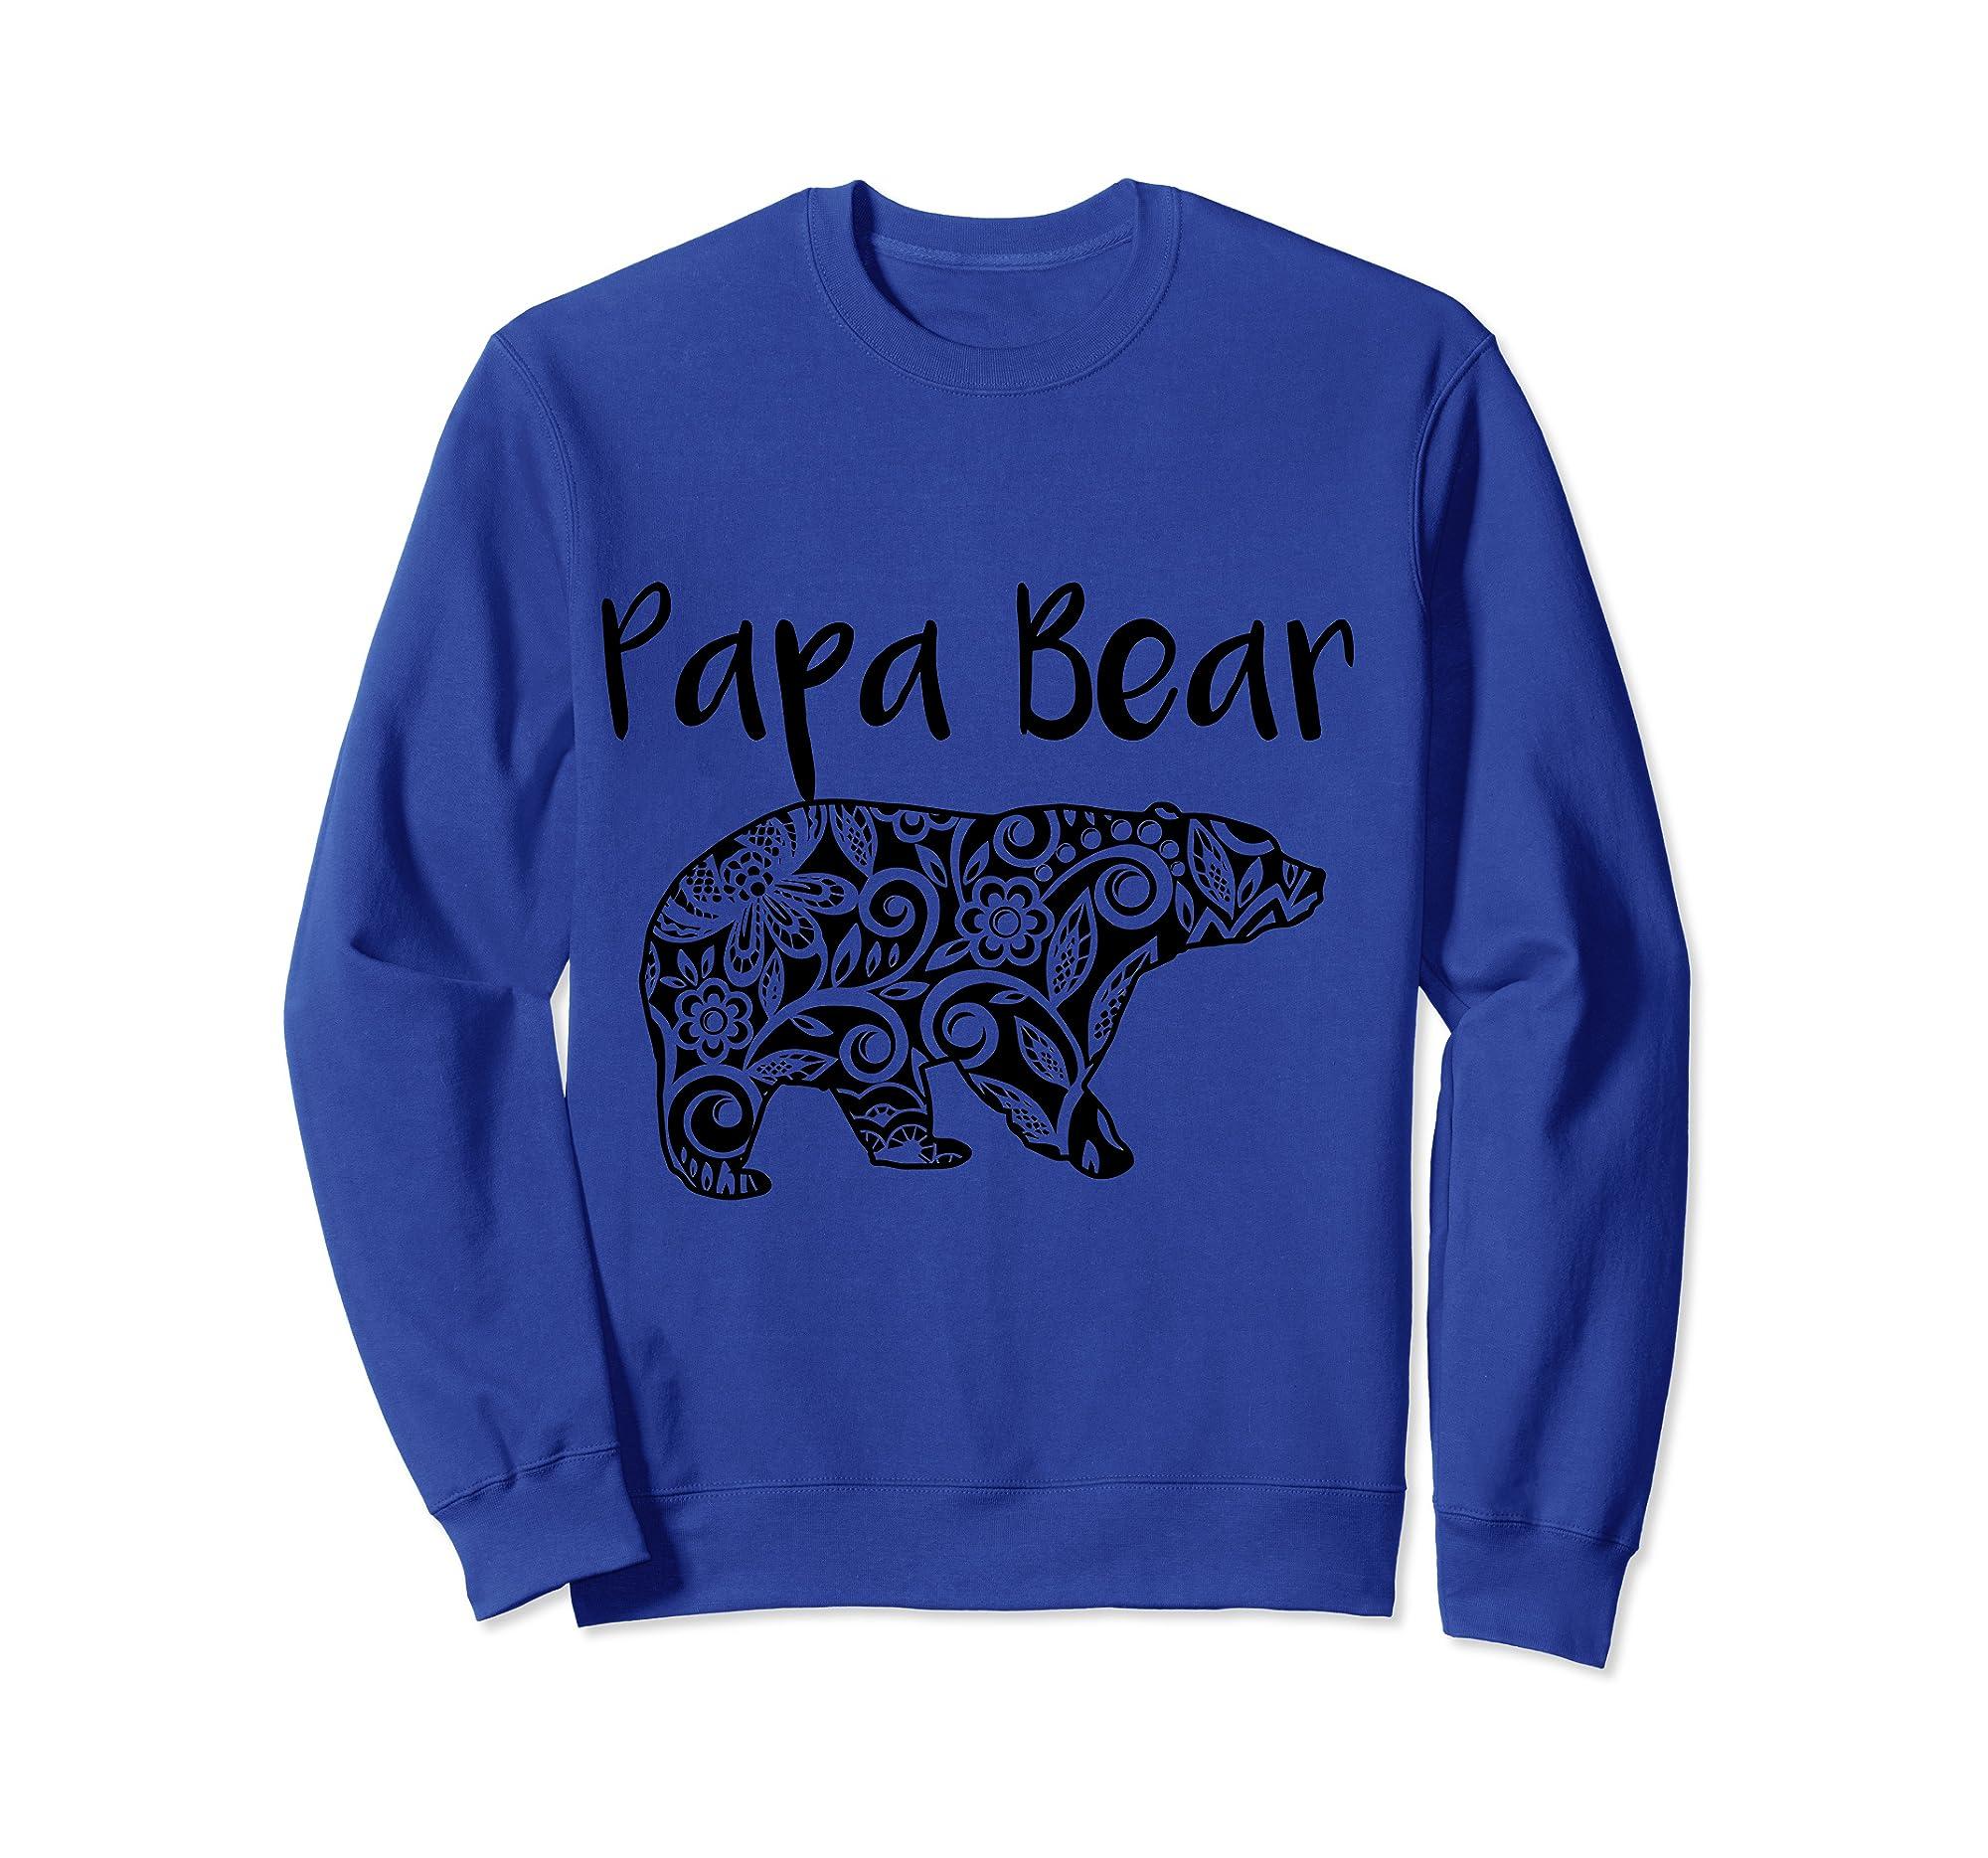 Fortuitous Dta Dta S Mama Papa Baby Bear Funny Family Matching Mother Day Ts Shirts Sweatshirt Royal Blue